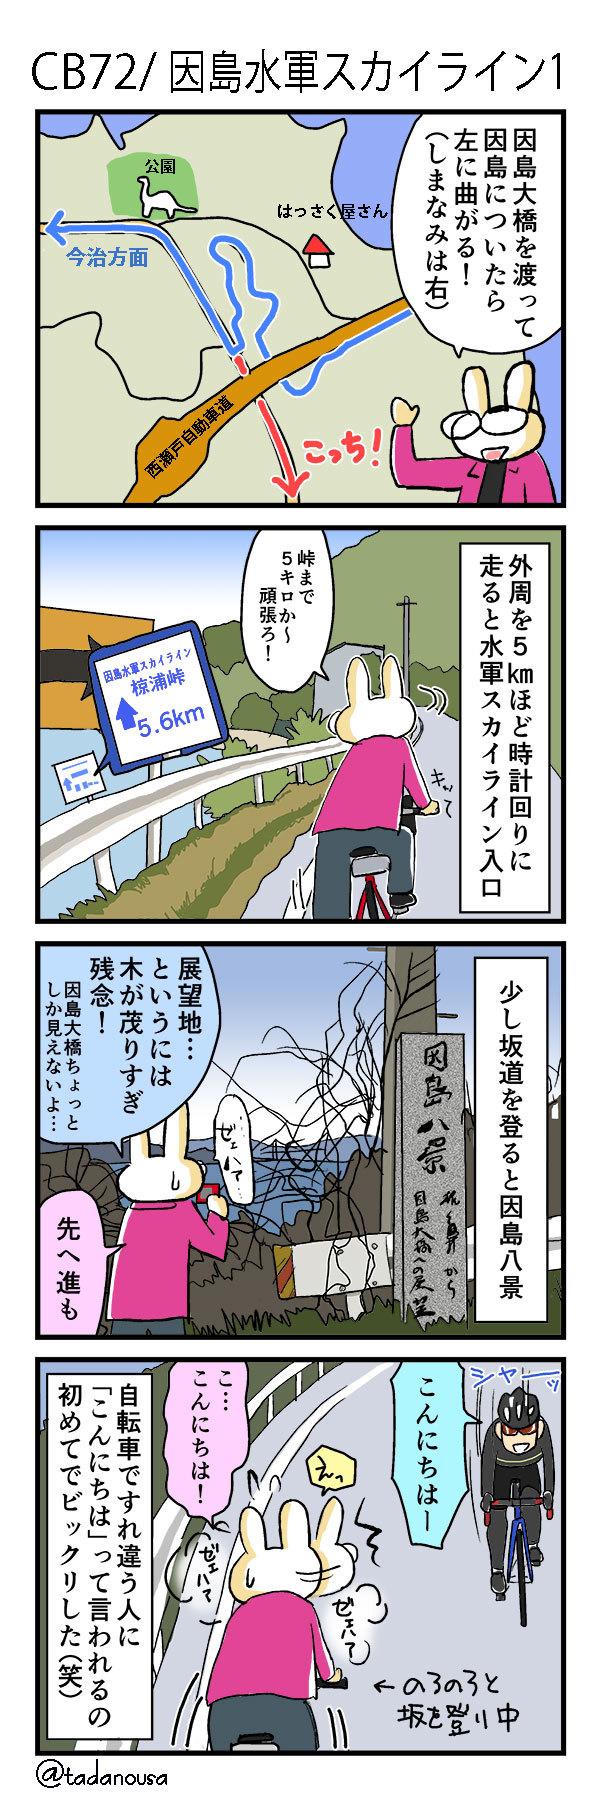 bike_4koma_kako112_s.jpg